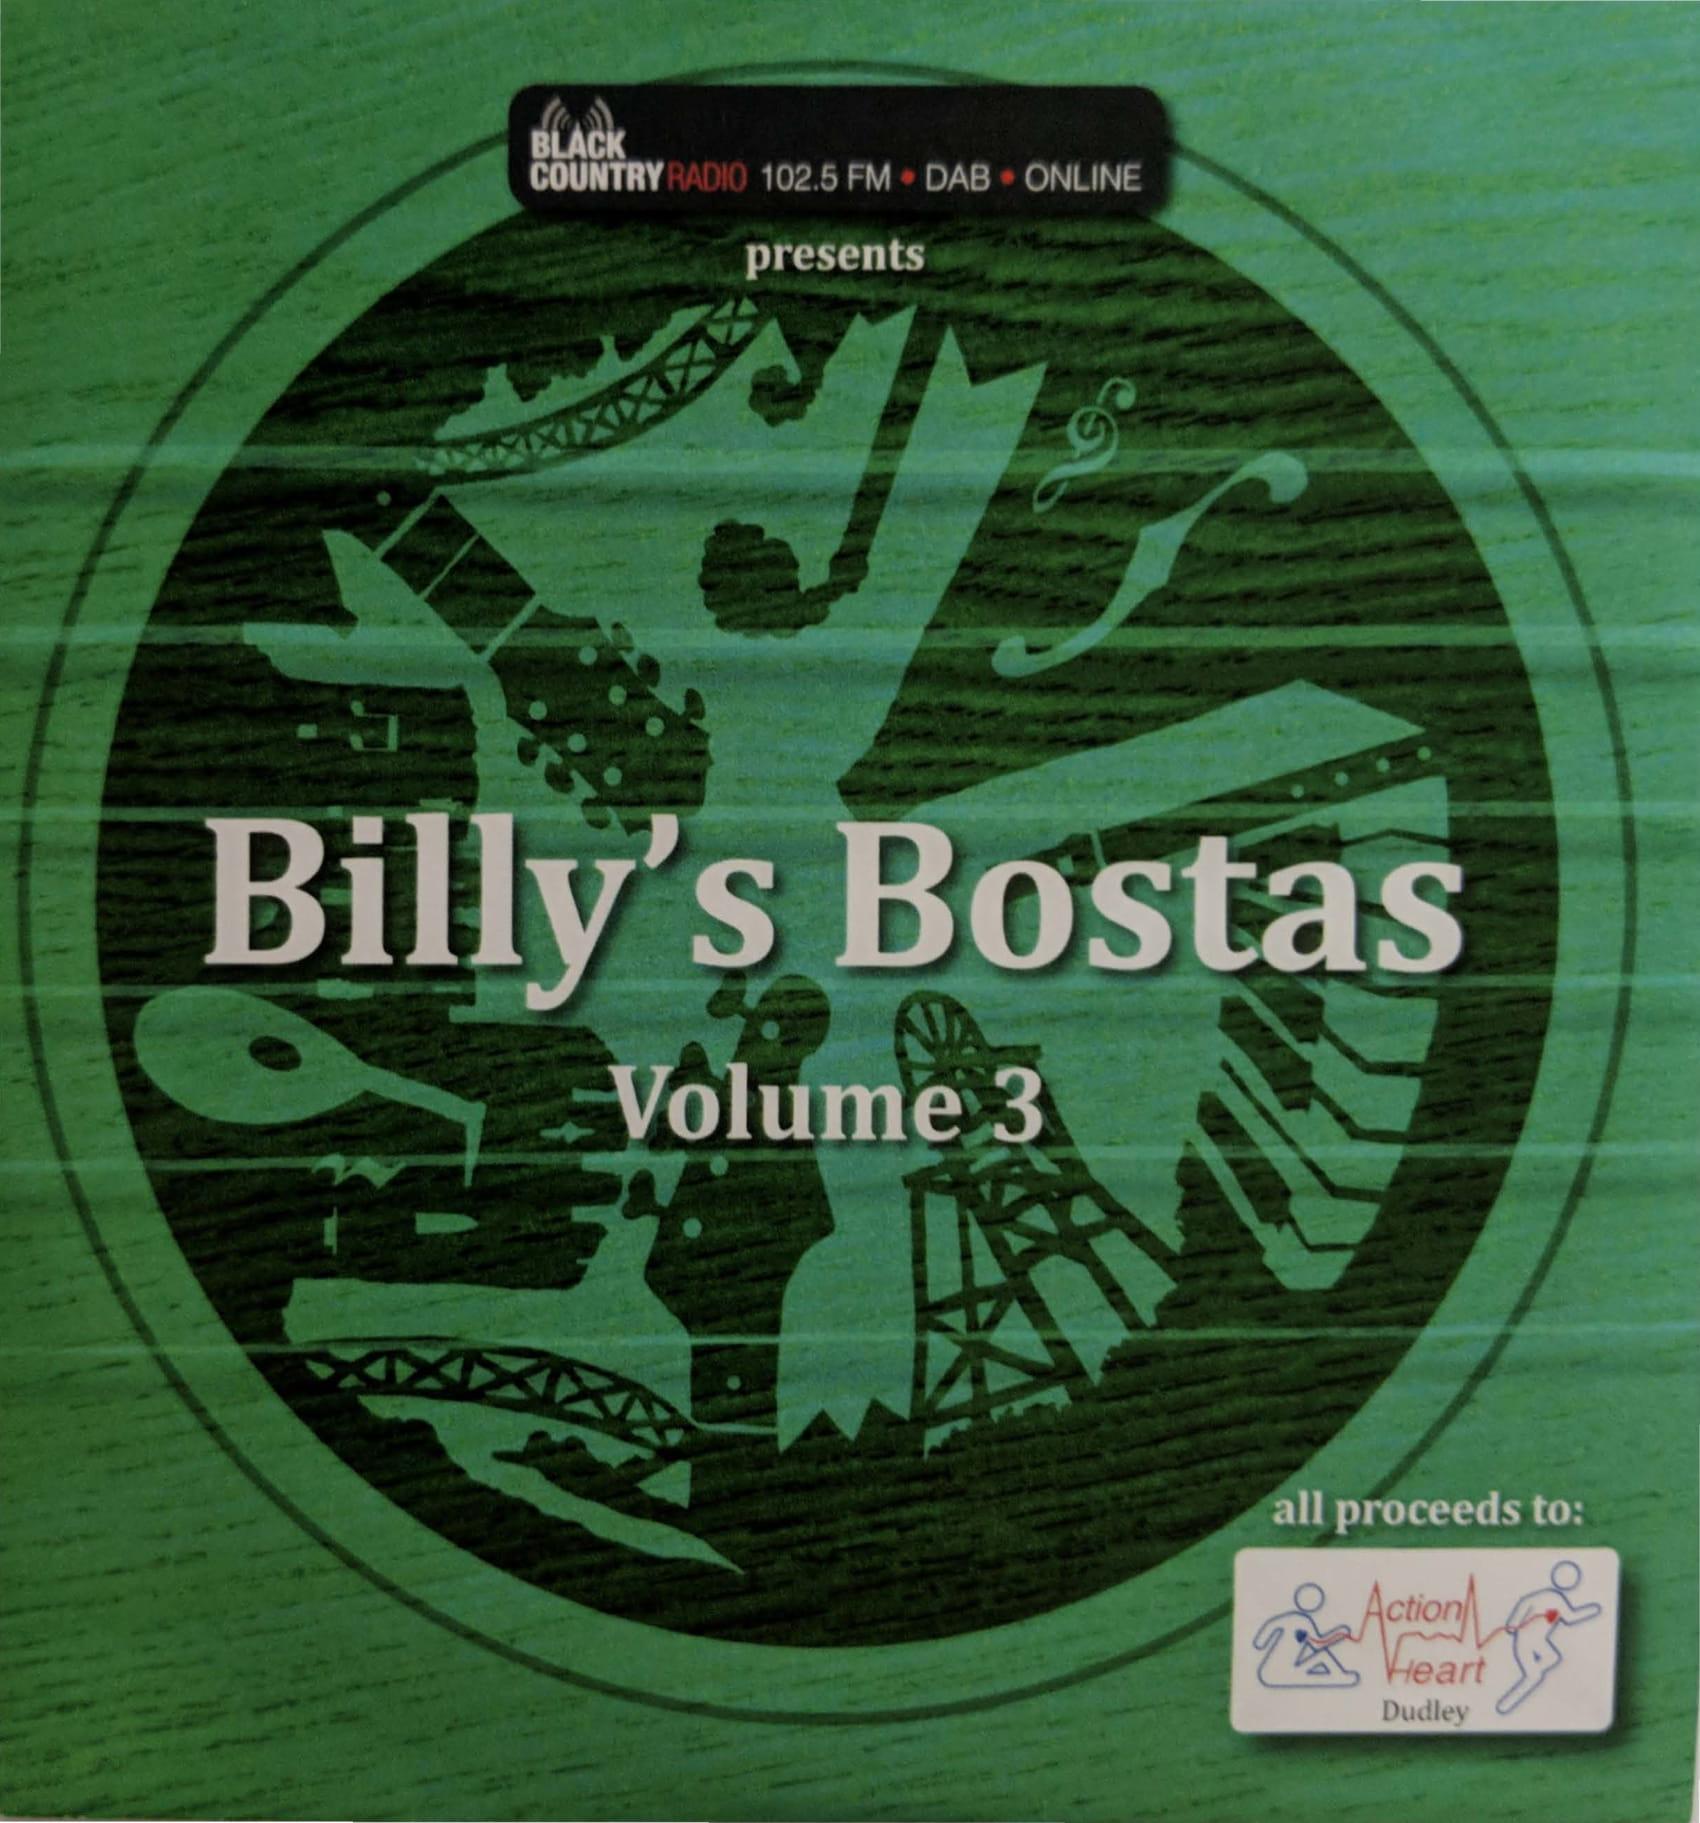 Billy's Bostas - Volume 3